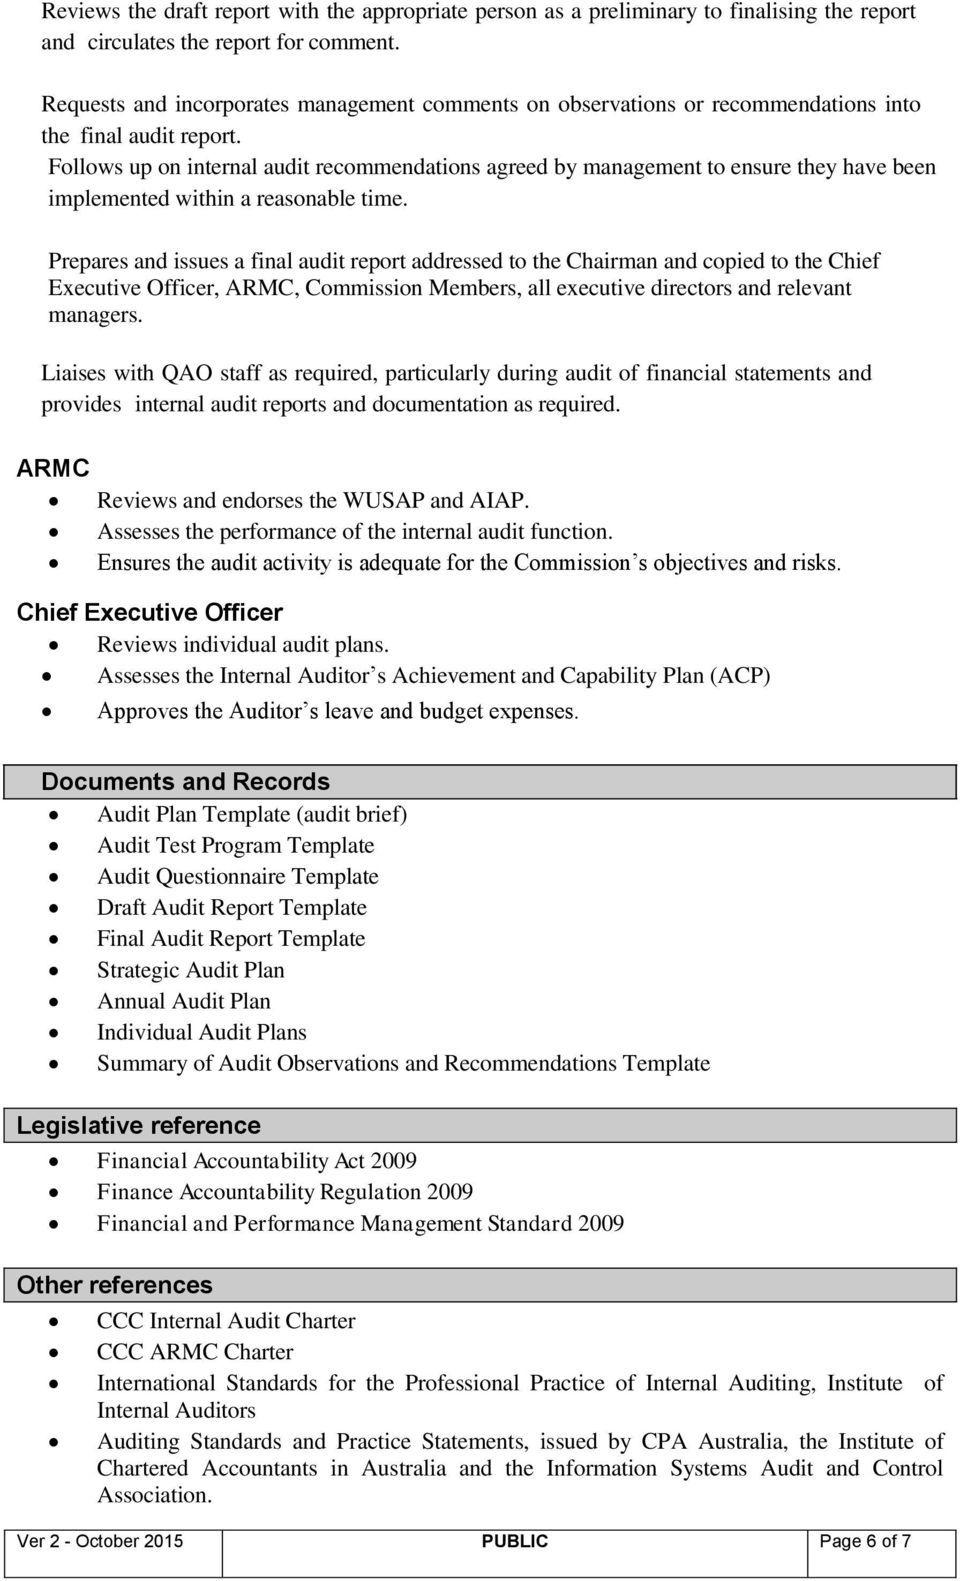 Internal Audit (Policy & Procedure) Pdf Free Download